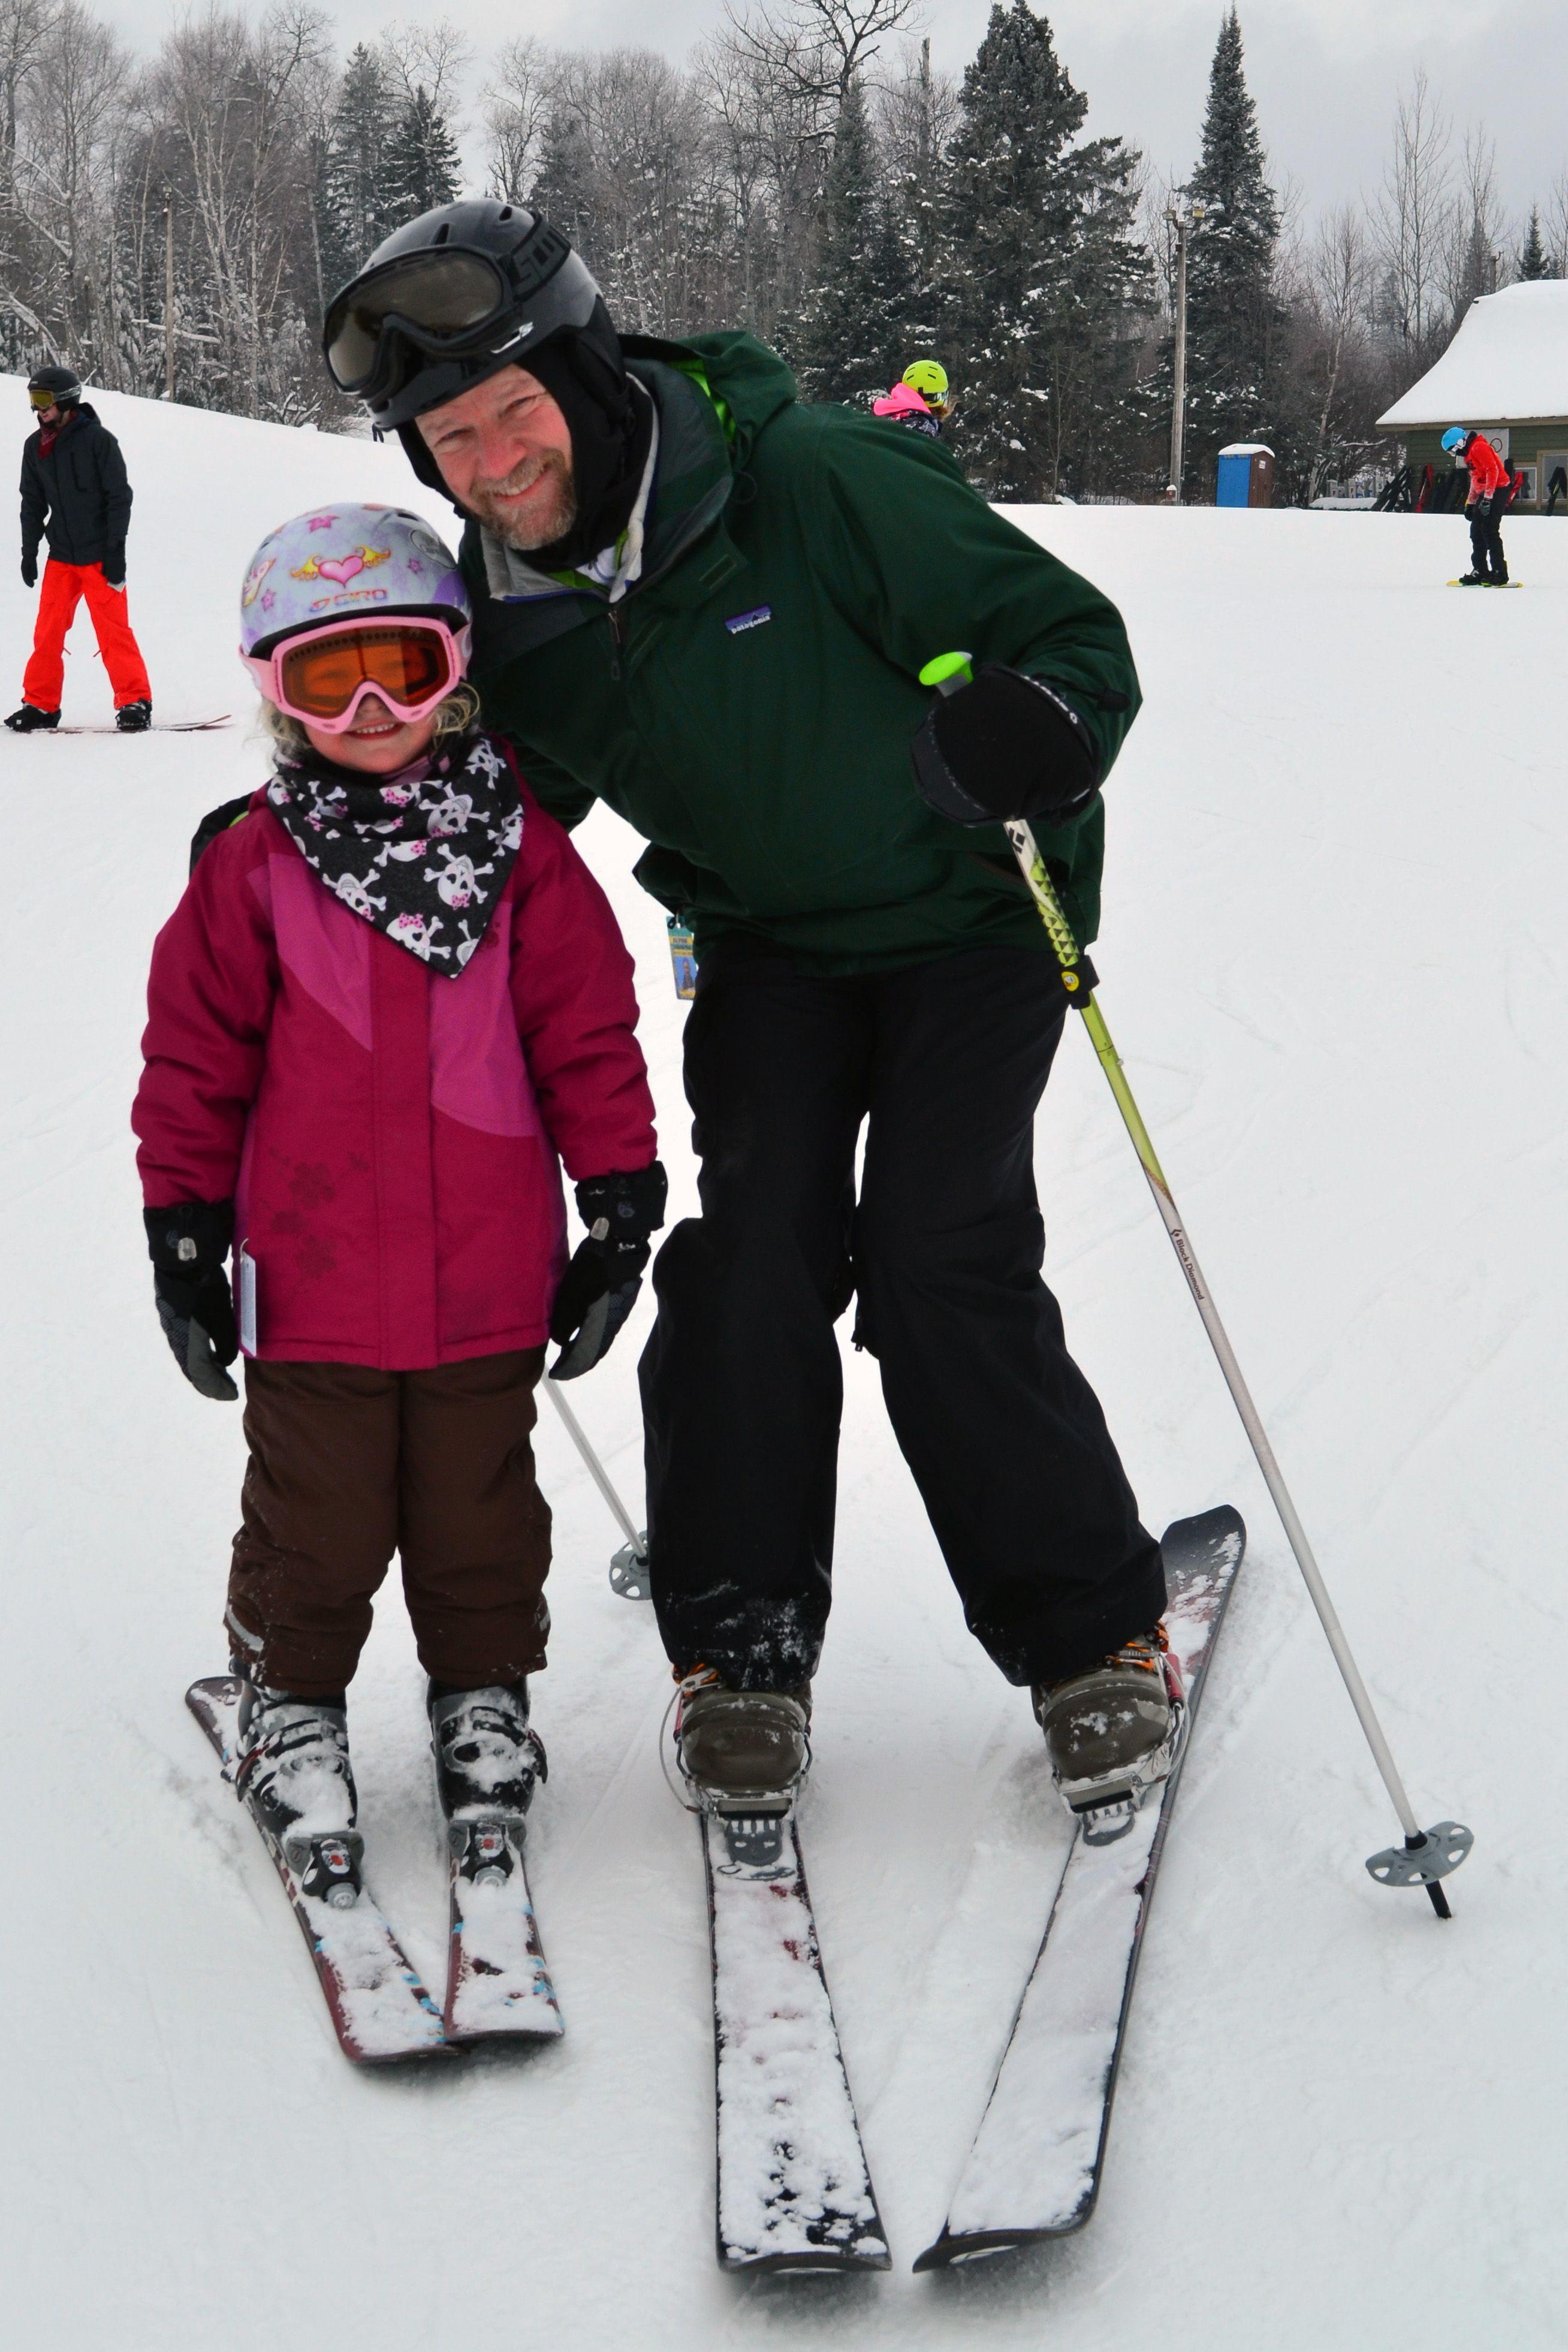 Family Fun At The Ridge Giantsridge Onlyinmn Winter Deals Snow Sports Cross Country Skiing